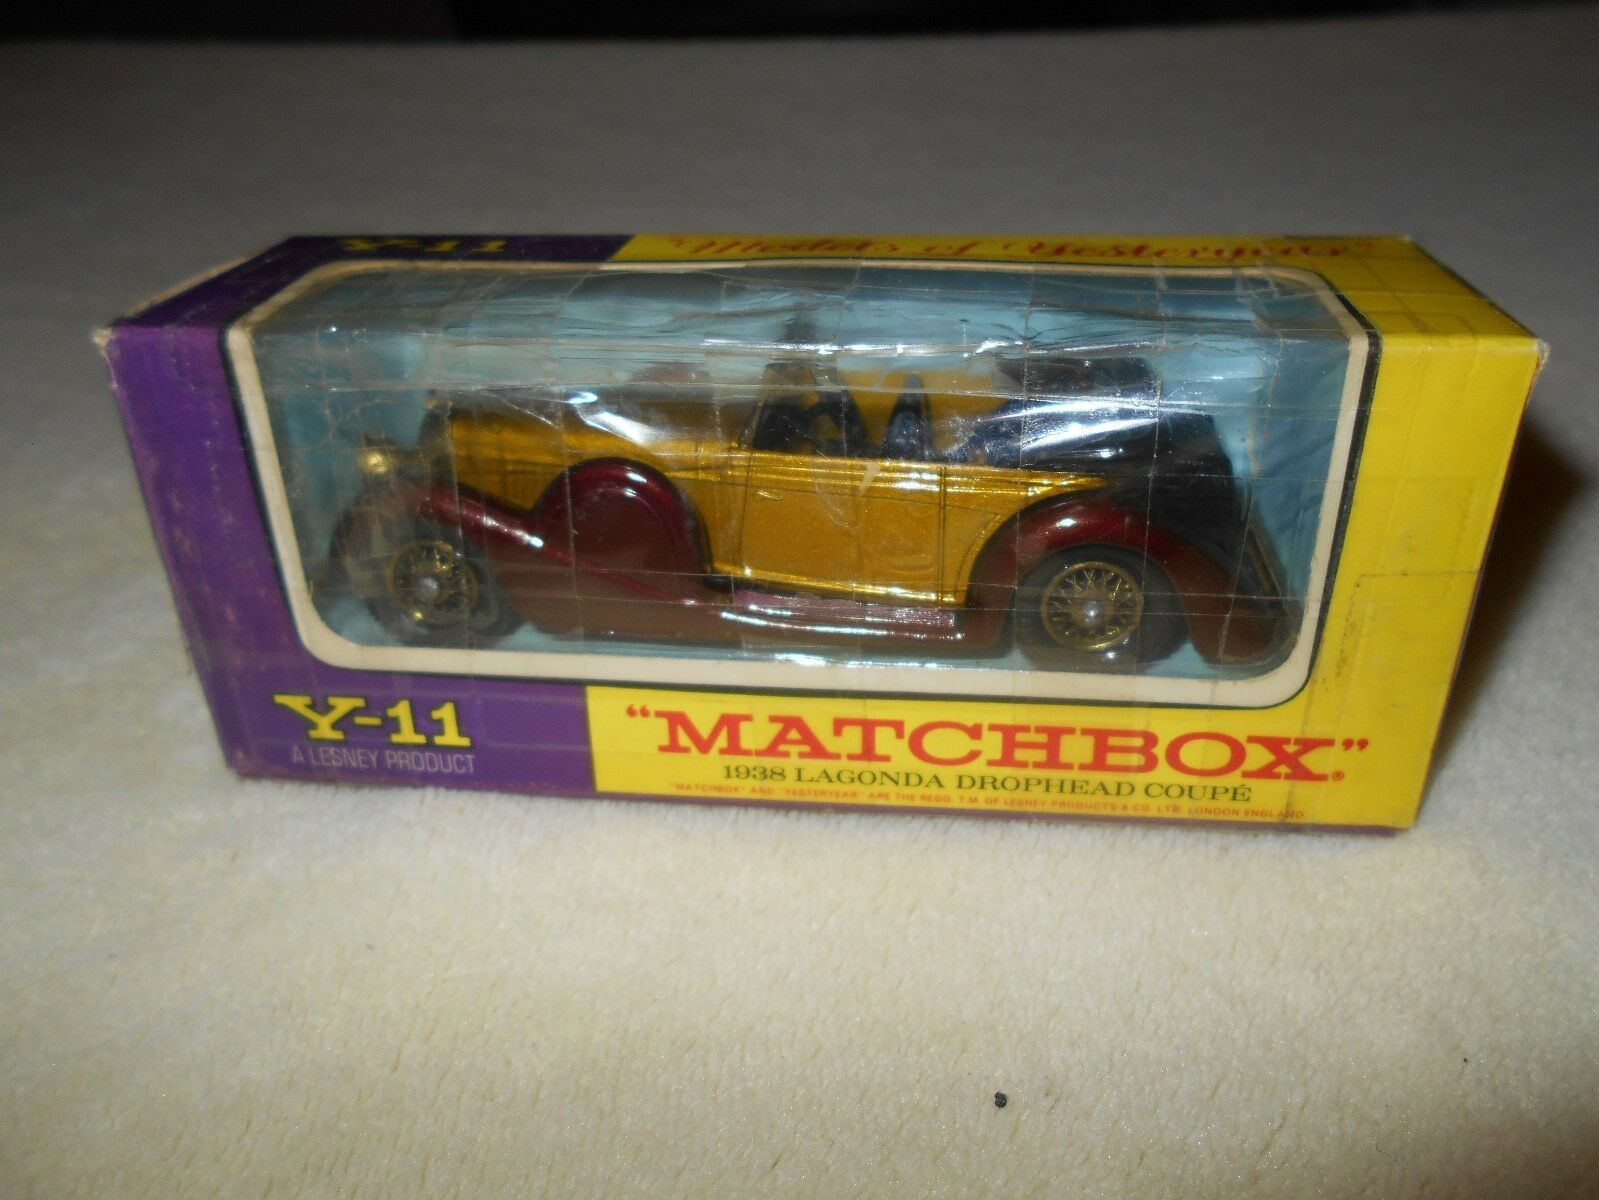 Matchbox 1938 Lagonda Drophead Coupe Y-11 1 43